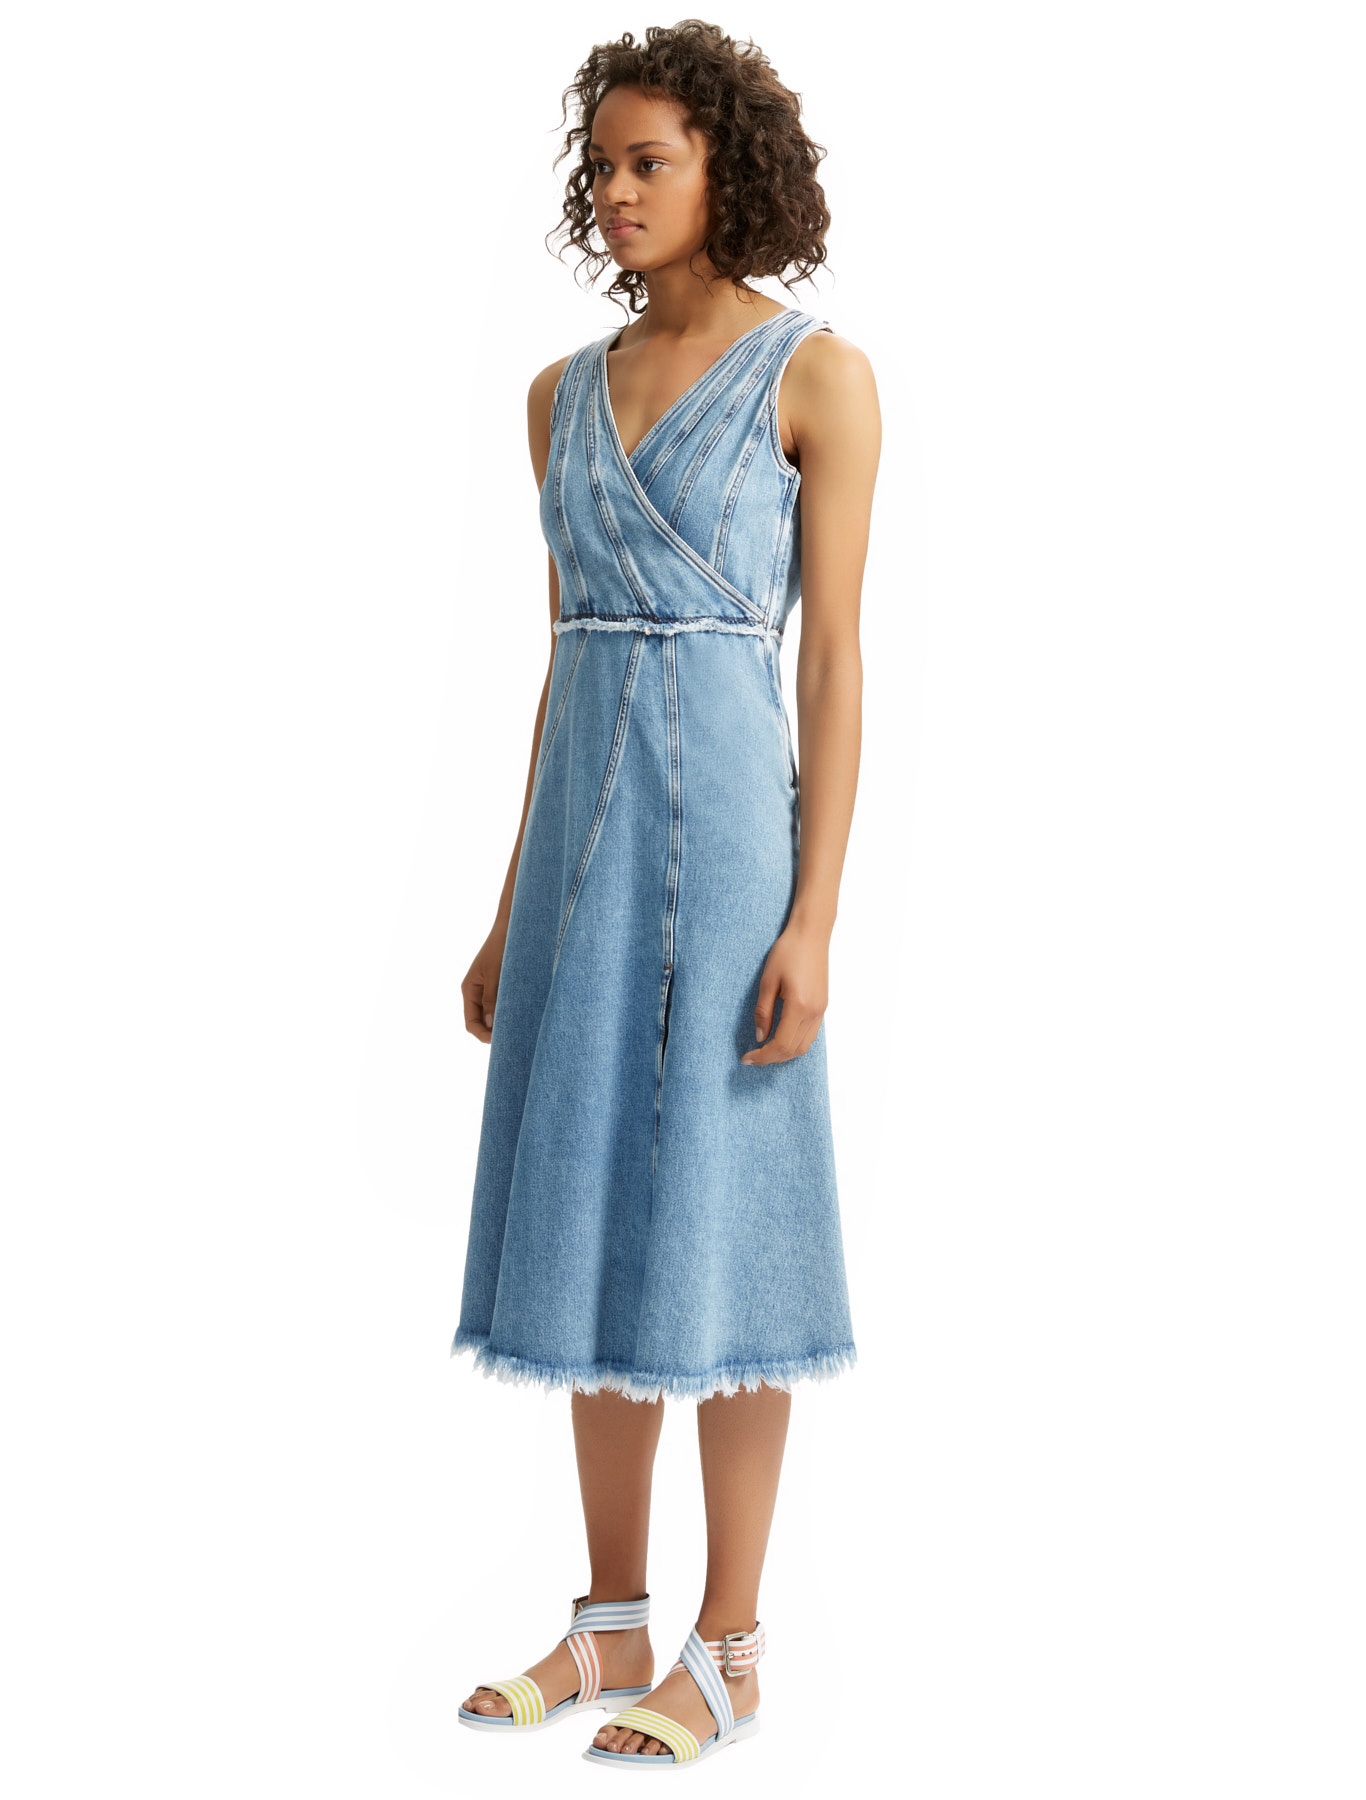 Asymmetric Washed Denim Dress, navy - Sportmax